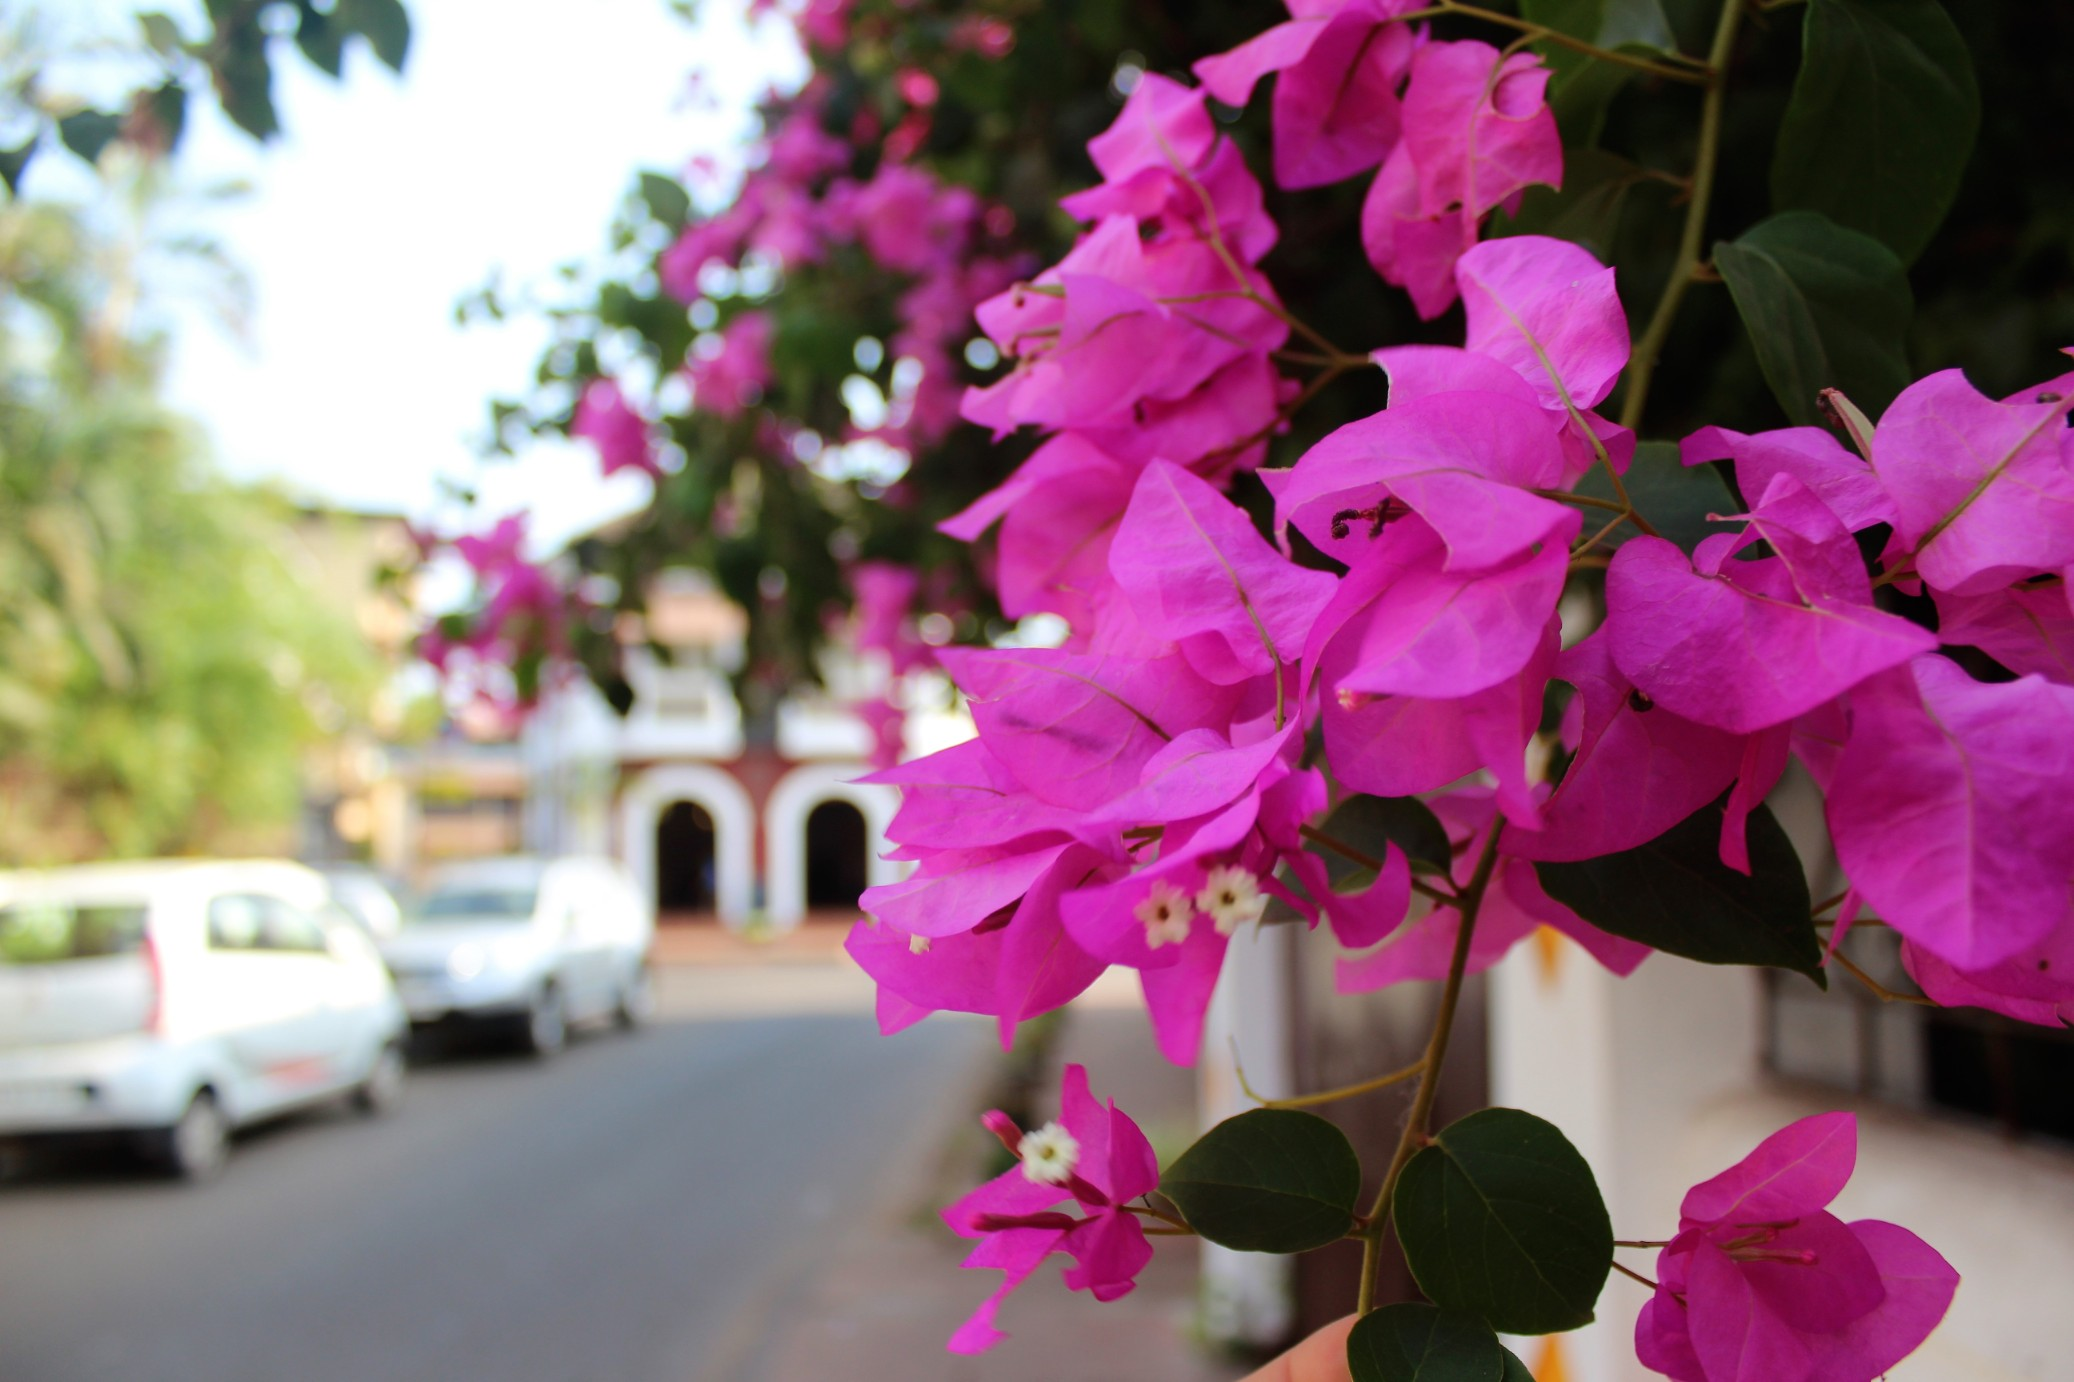 Flowers in Old Town Panjim